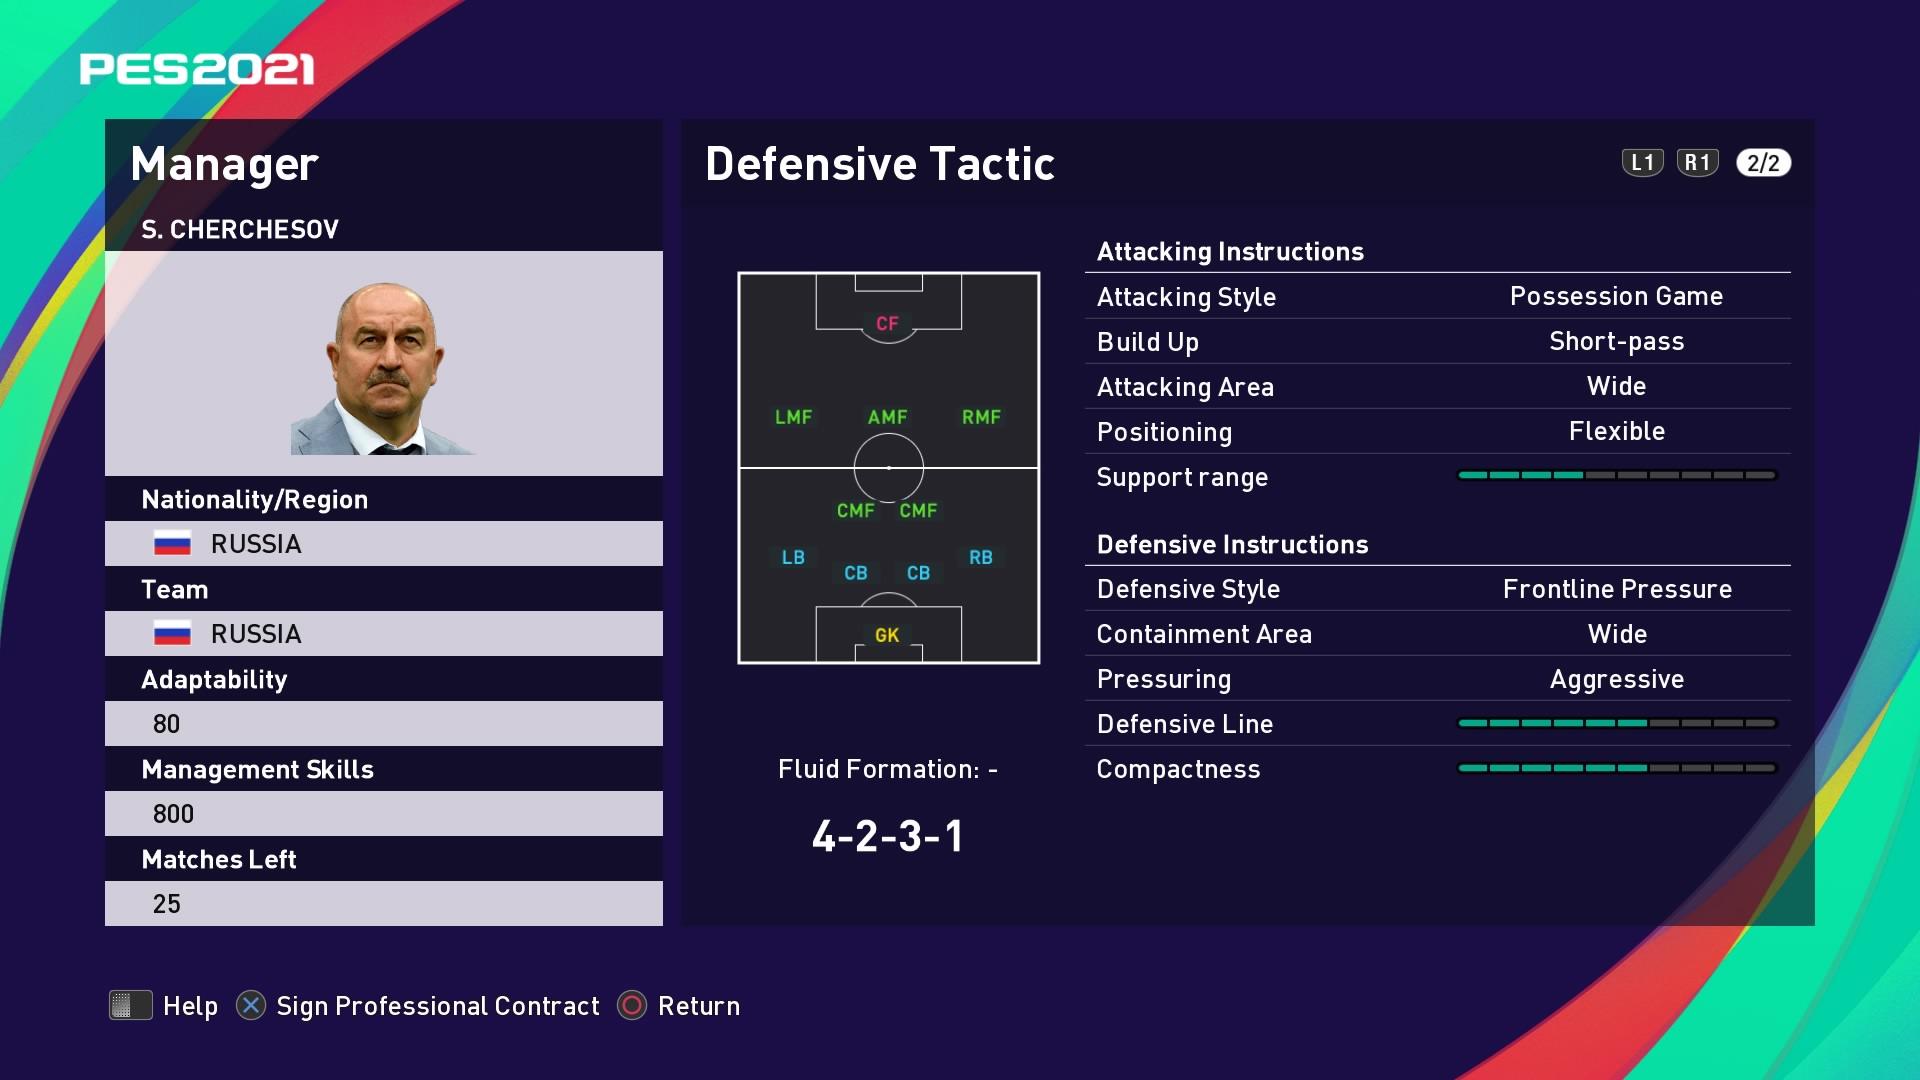 S. Cherchesov (Stanislav Cherchesov) Defensive Tactic in PES 2021 myClub